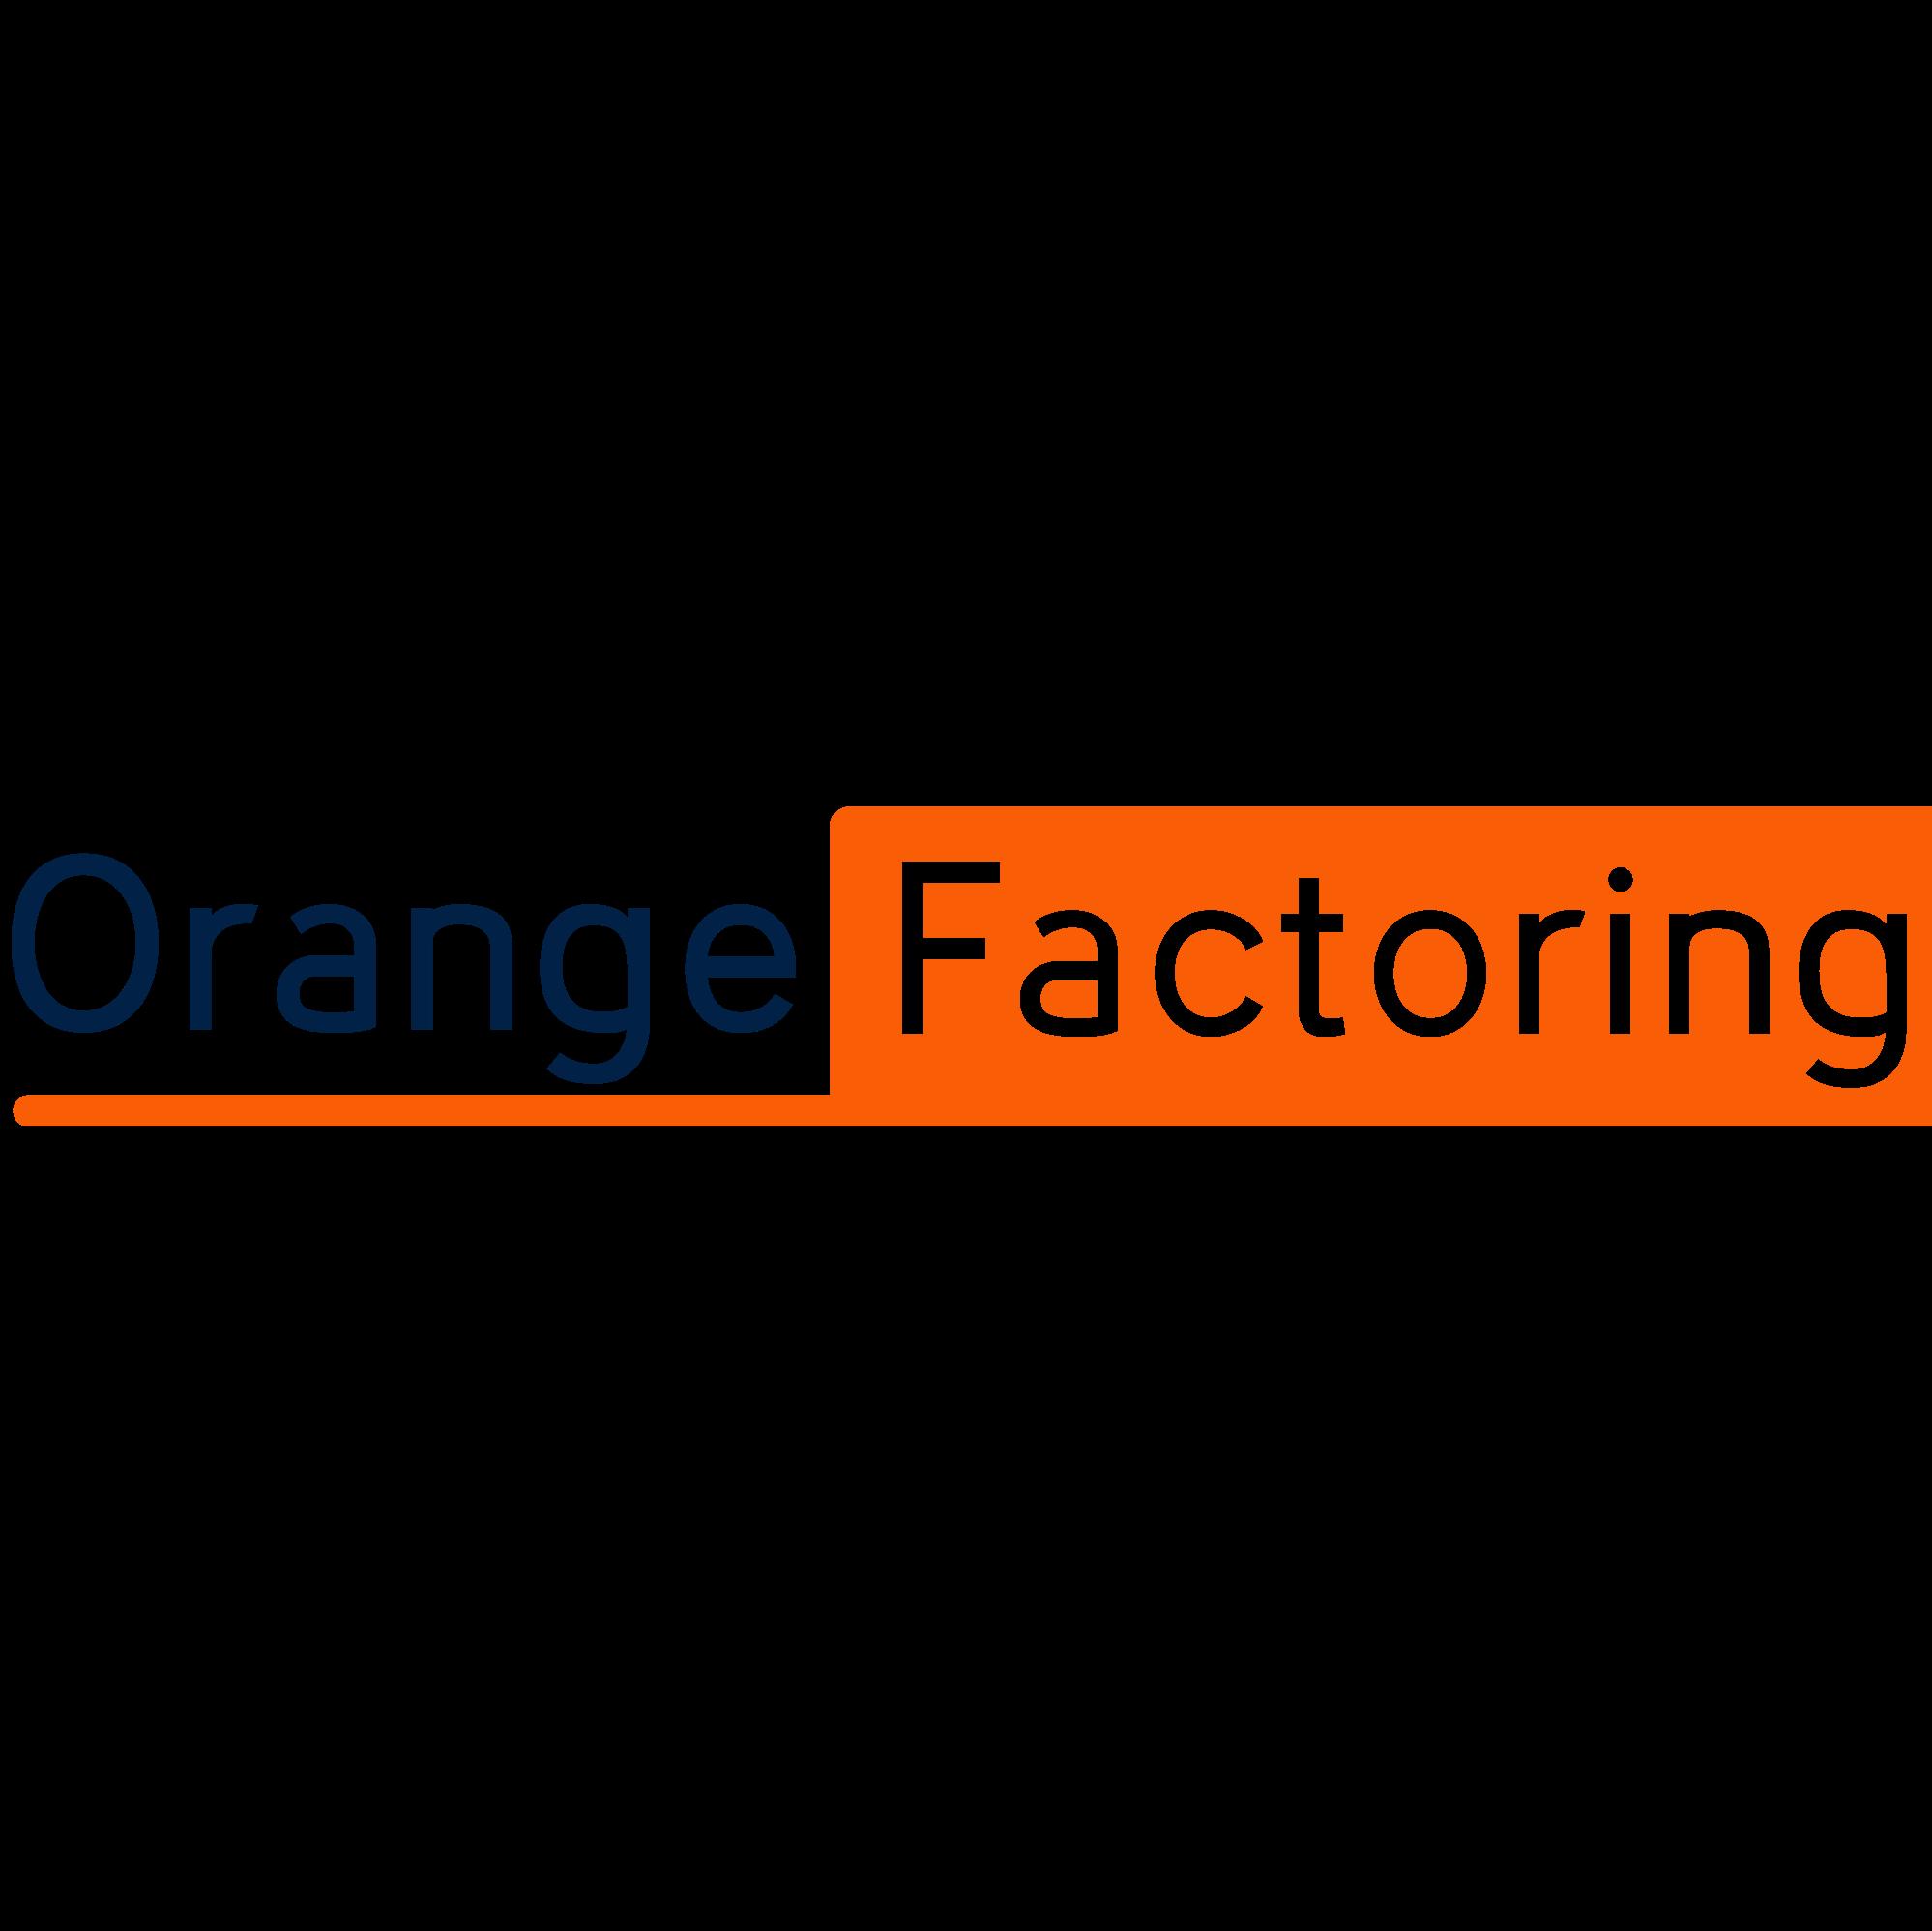 Orange Factoring